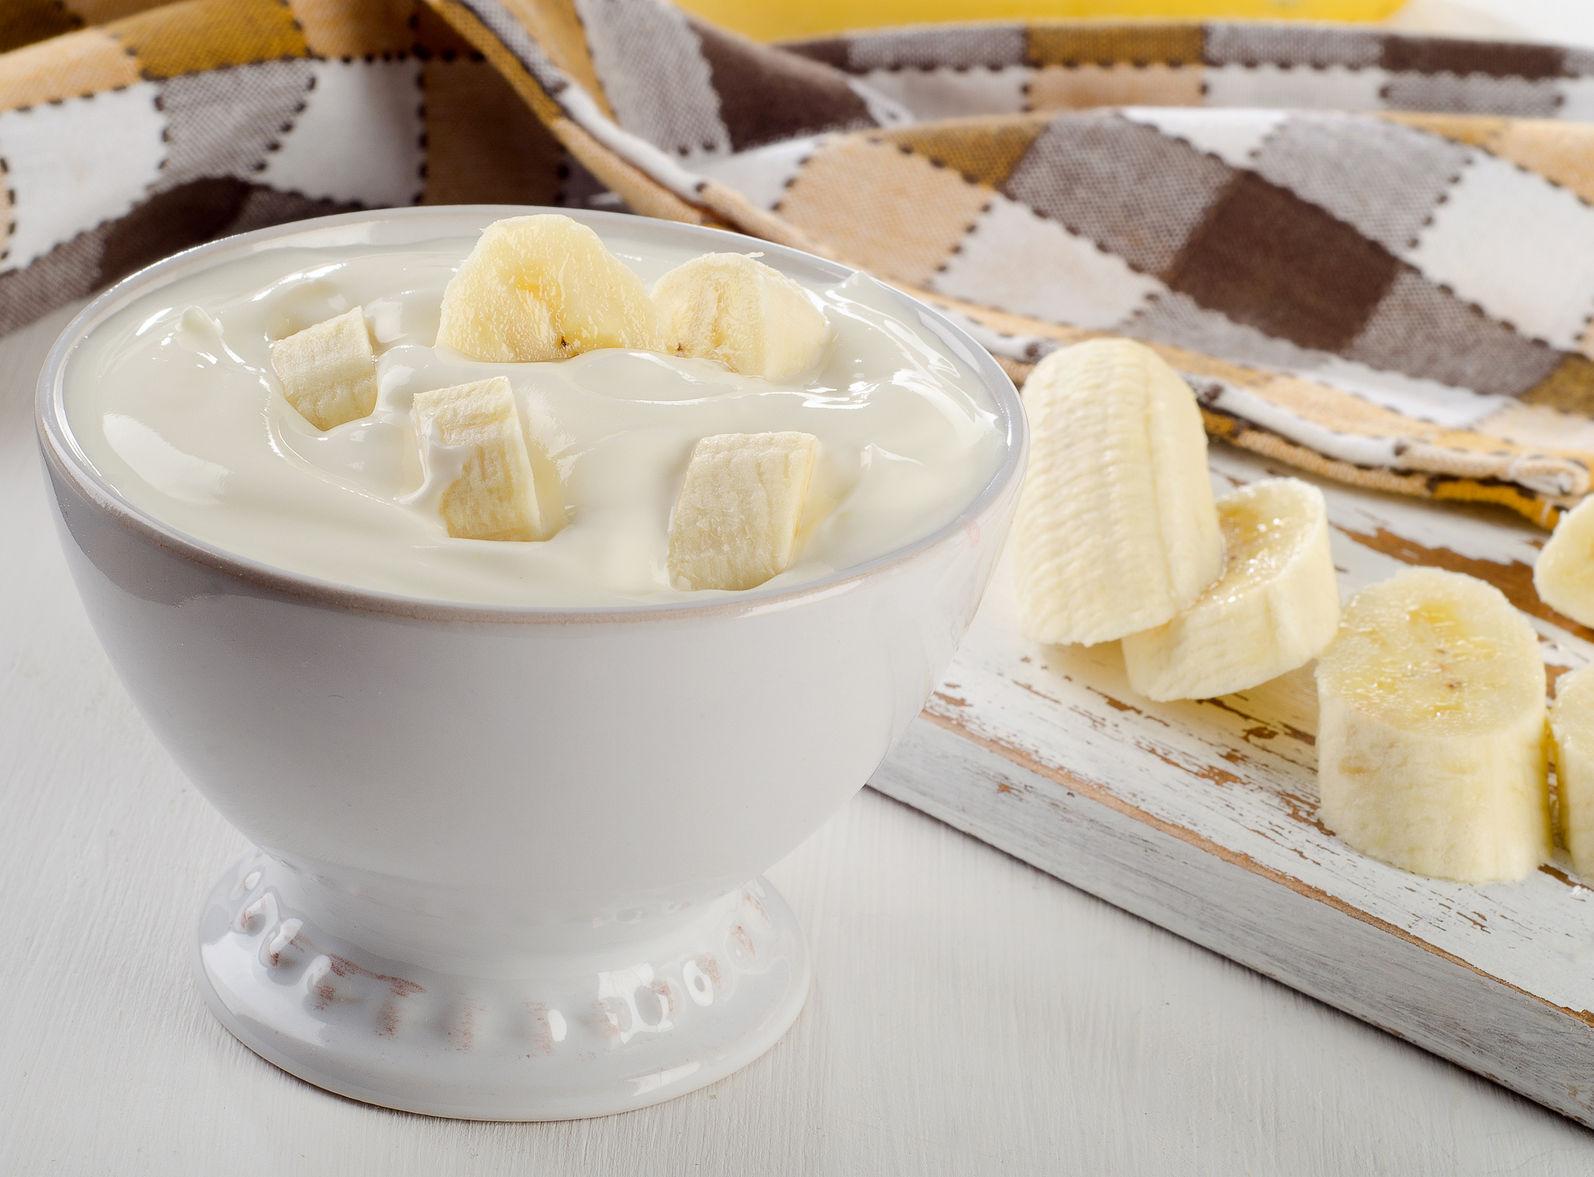 Yogurt. https://www.info-on-high-blood-pressure.com/gut-health.html